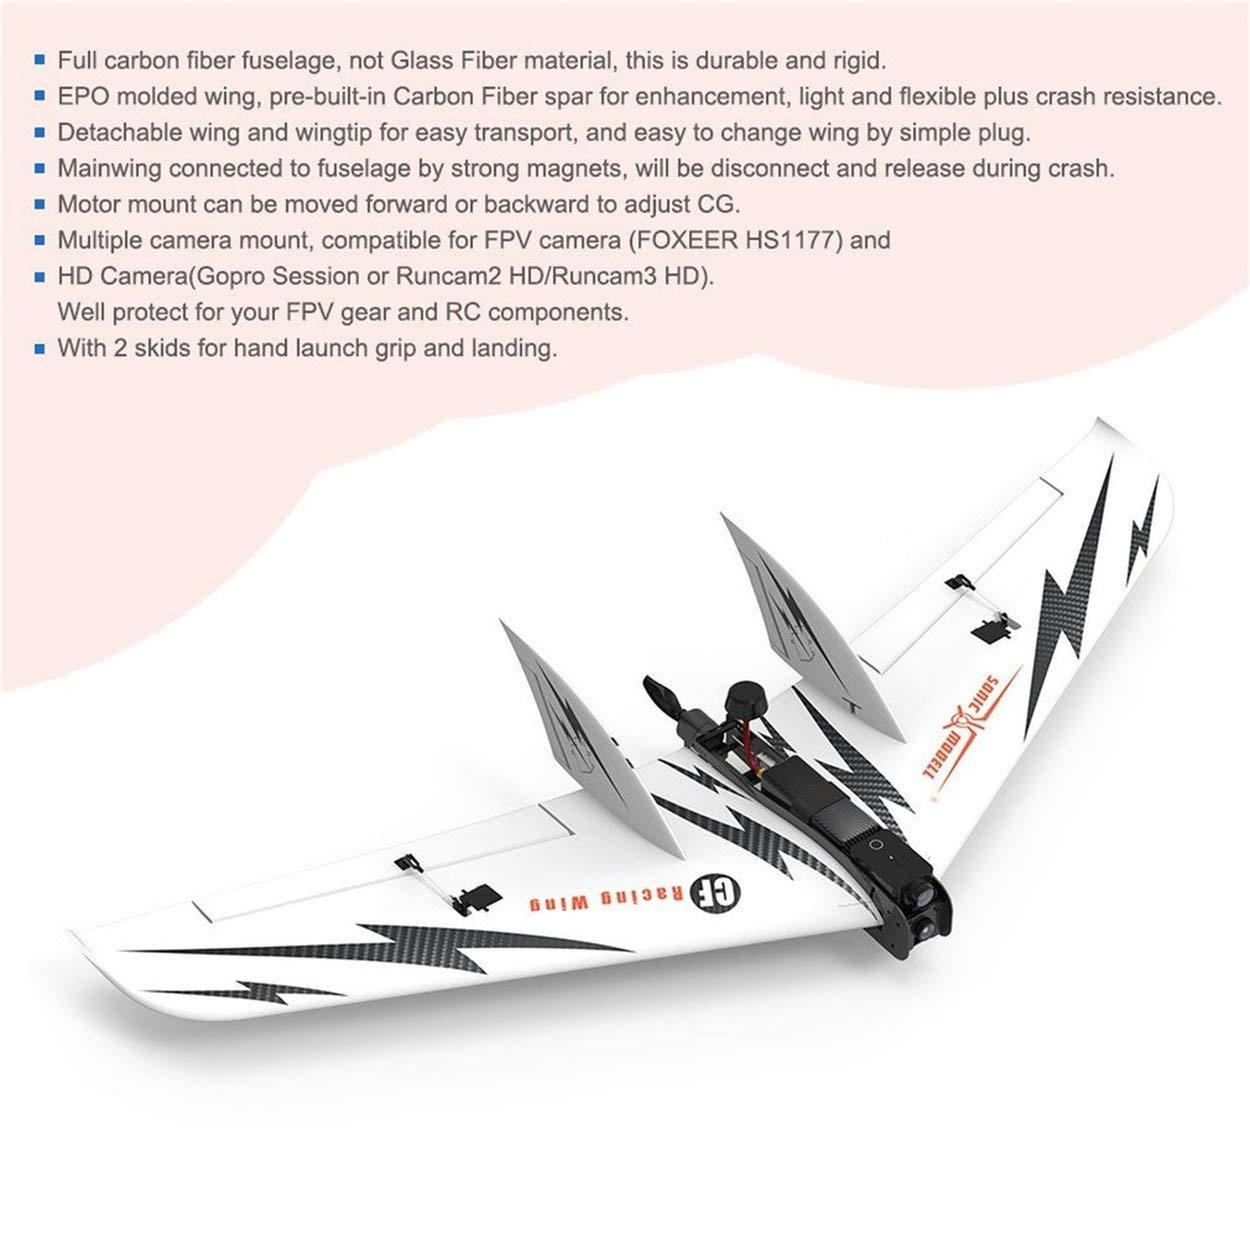 Lorenlli Fit Sonic Modell 1030mm Drohne Spannweite EPO FPV Festflügel RC Flugzeug Drohne 1030mm Flugzeug PNP Kohlefaser RC Flugzeug mit Brushless Motor dcfc5c